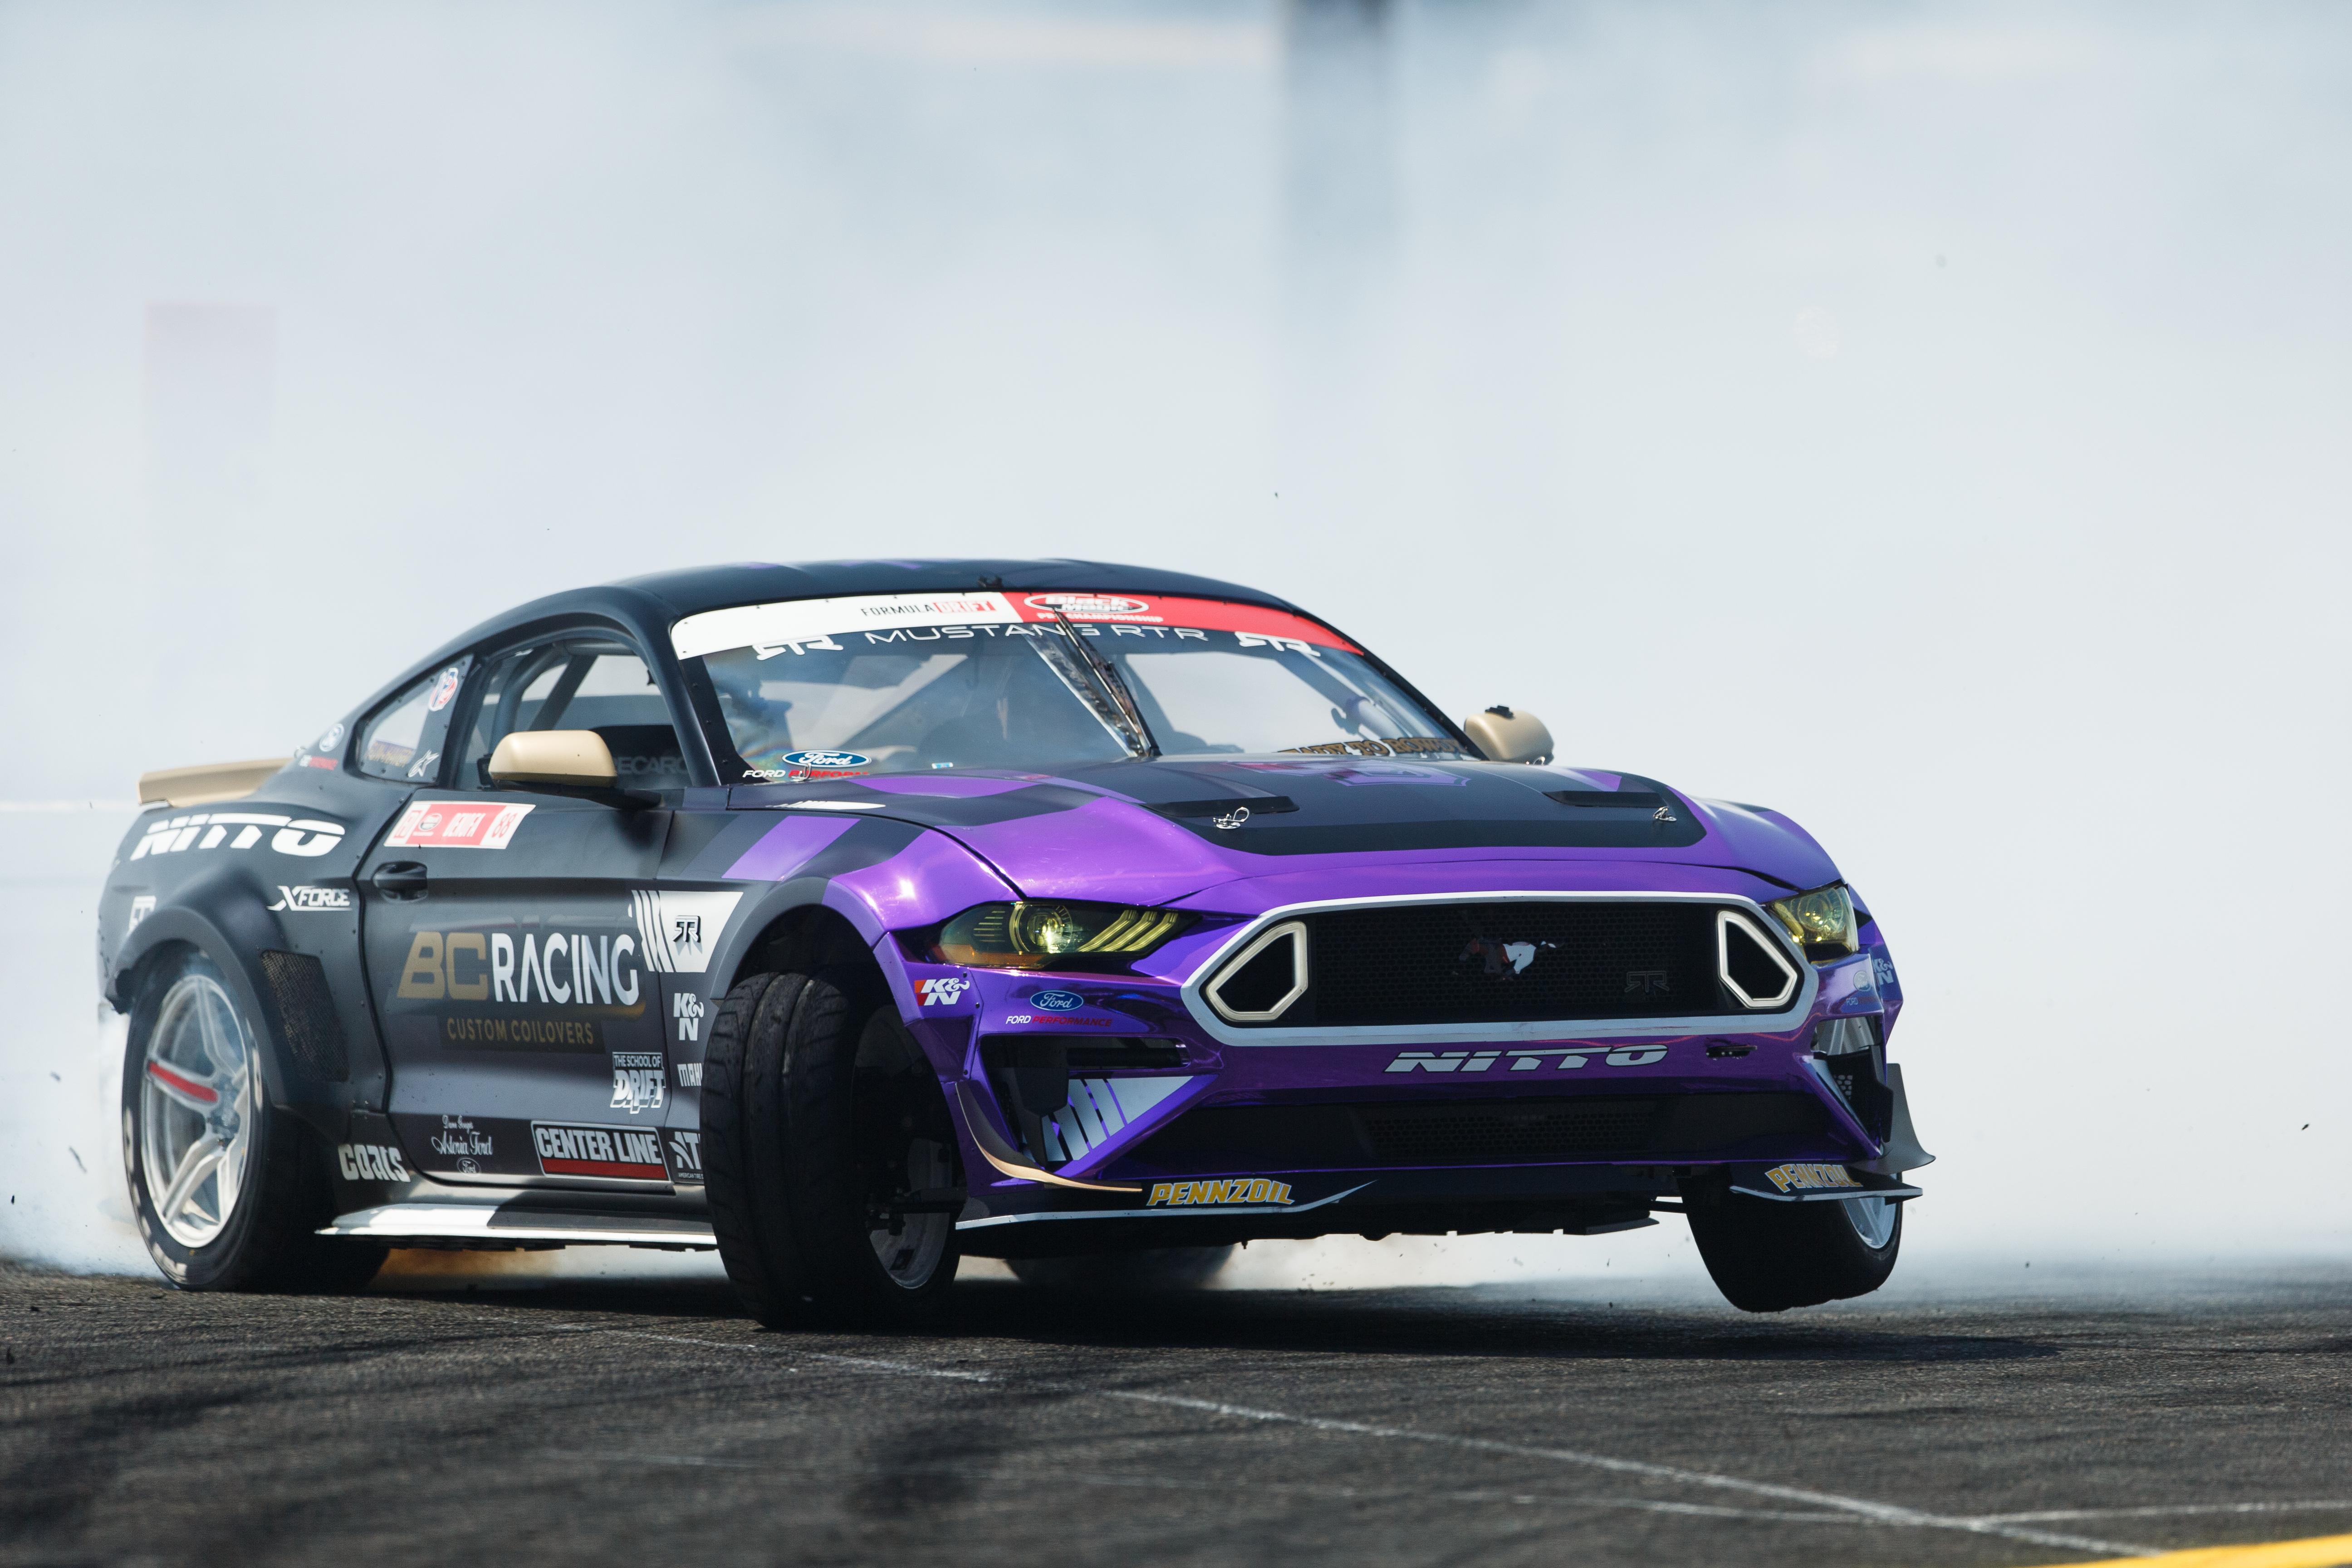 bc-racing-chelsea-denofa-gallery_0157